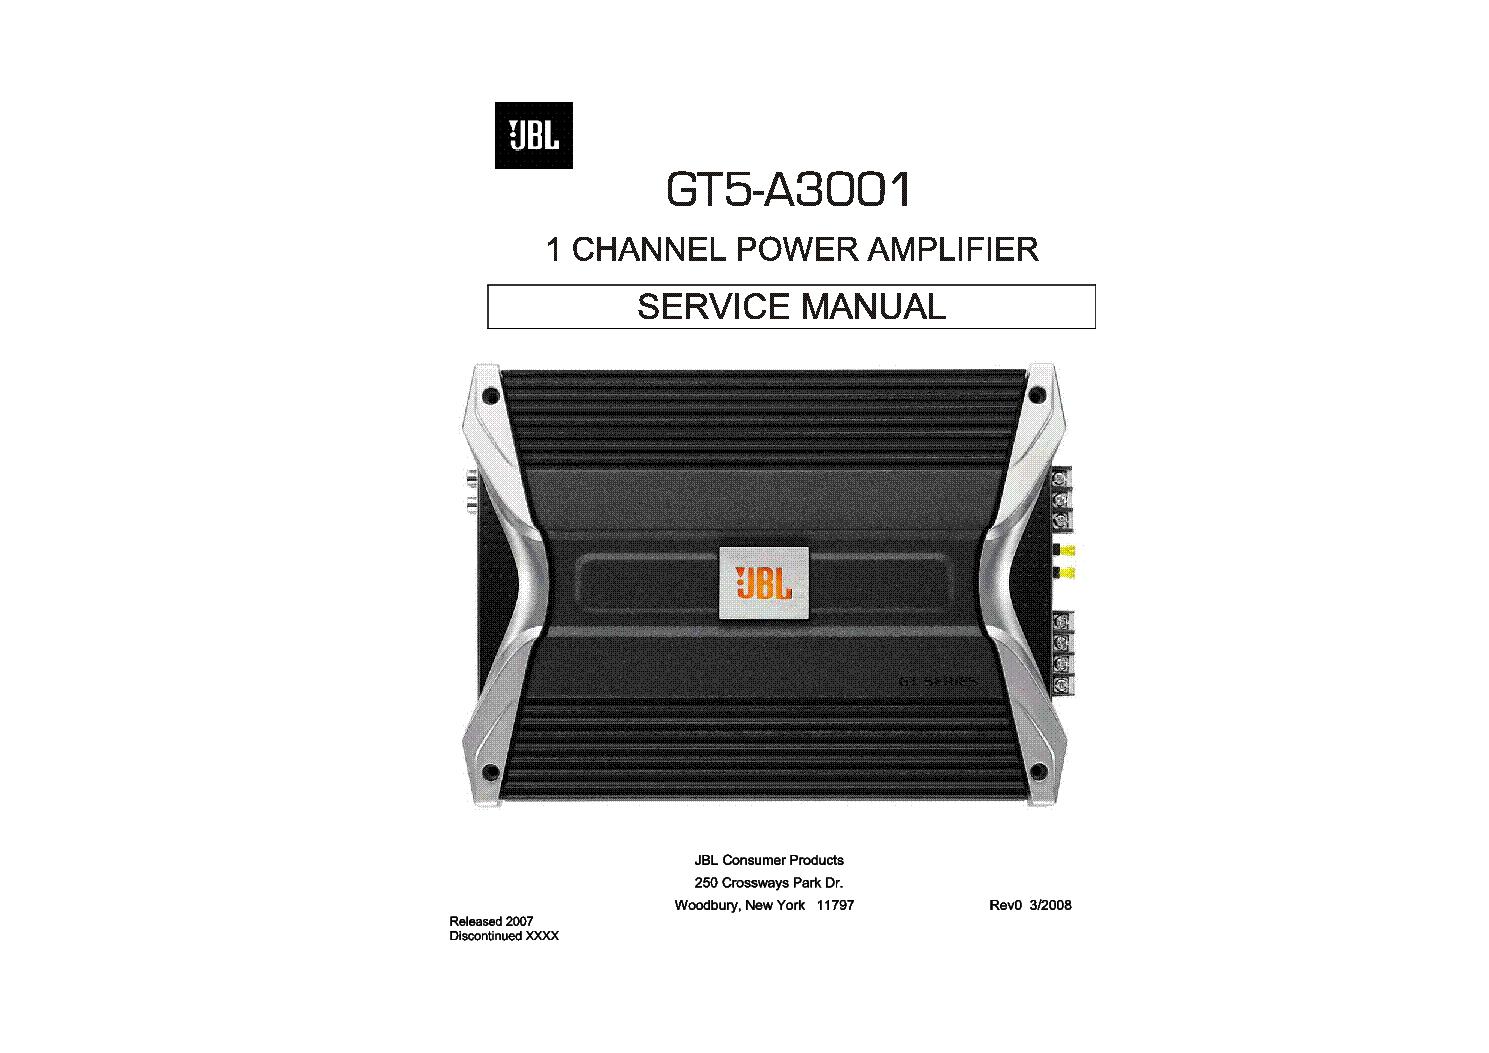 jbl gt5 a3011 car power amplifier sm service manual download rh elektrotanya com JBL Amplifier Repair JBL Home Amplifiers